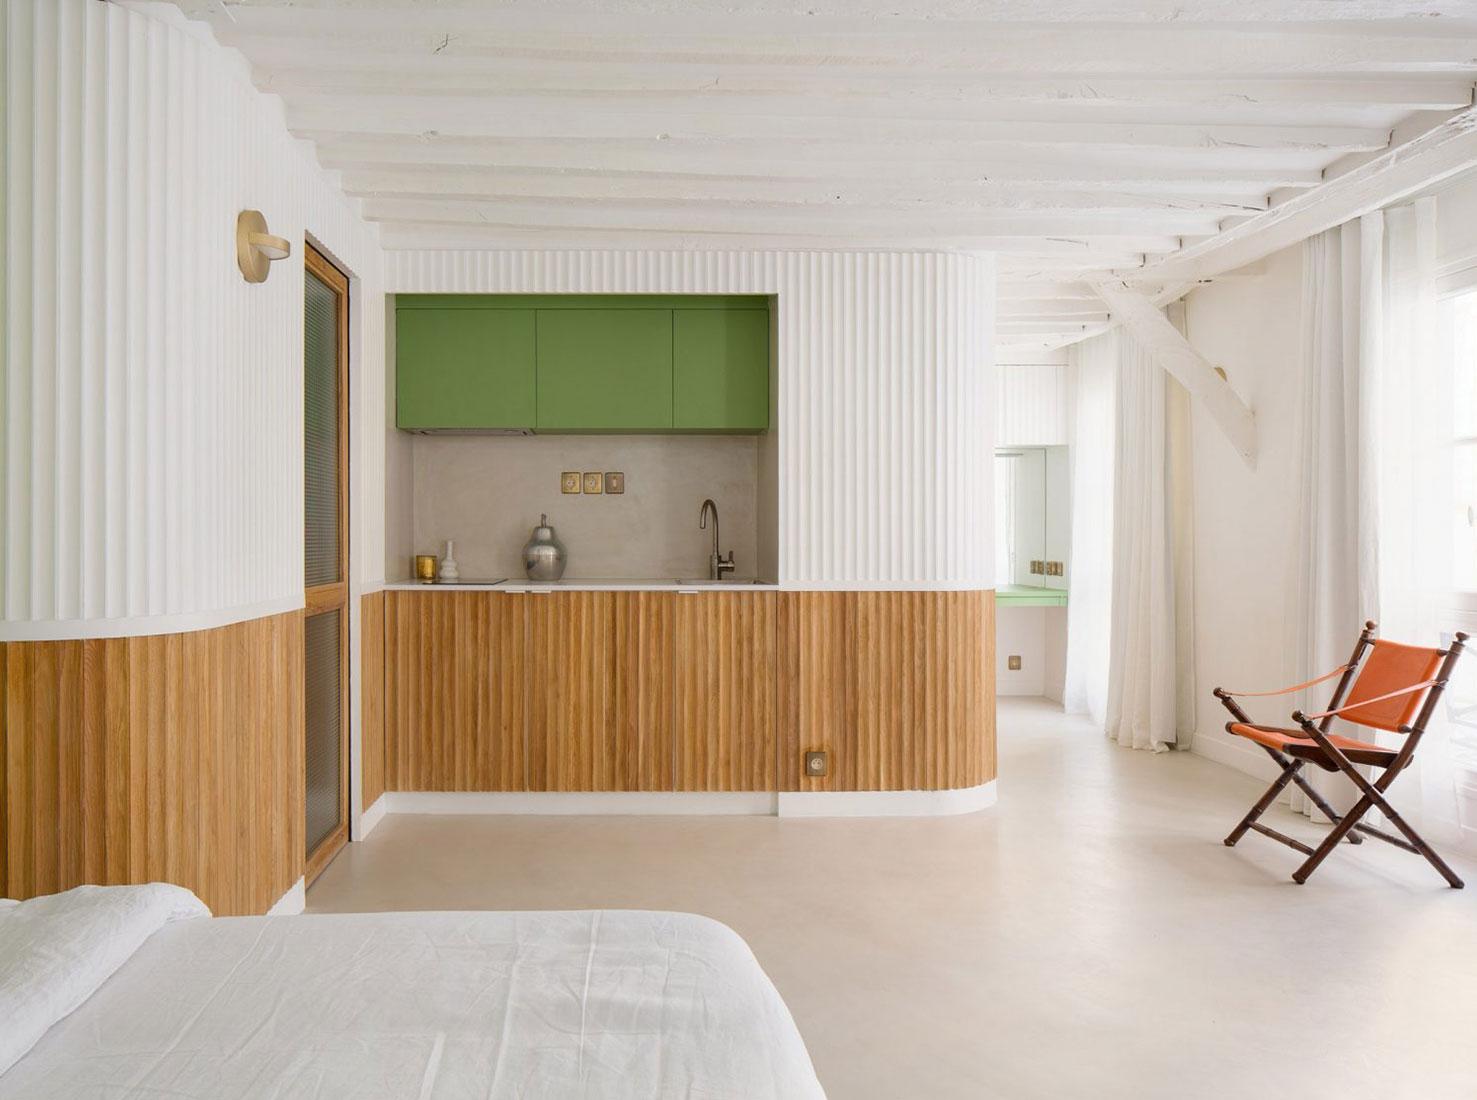 Дизайн квартиры-студии фото